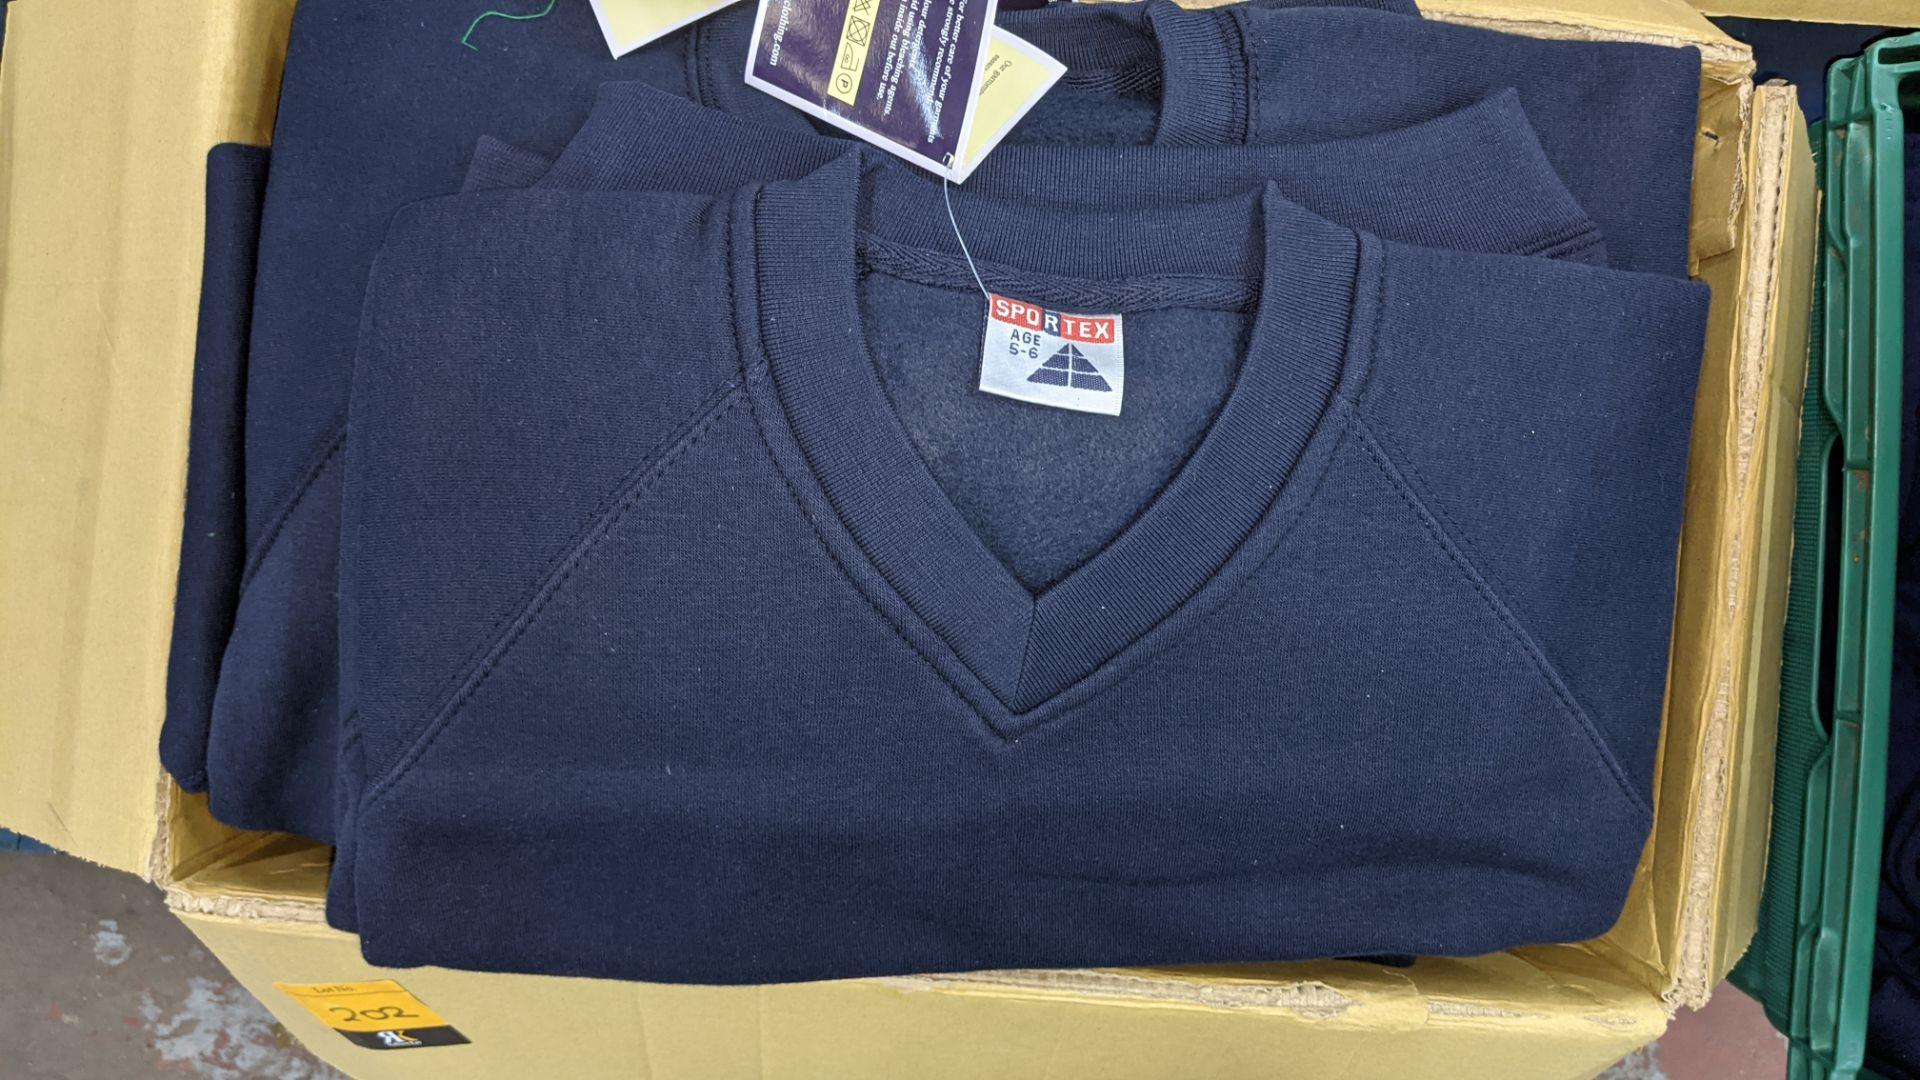 Approx 14 off Sportex children's blue V-neck sweatshirts - Image 3 of 4